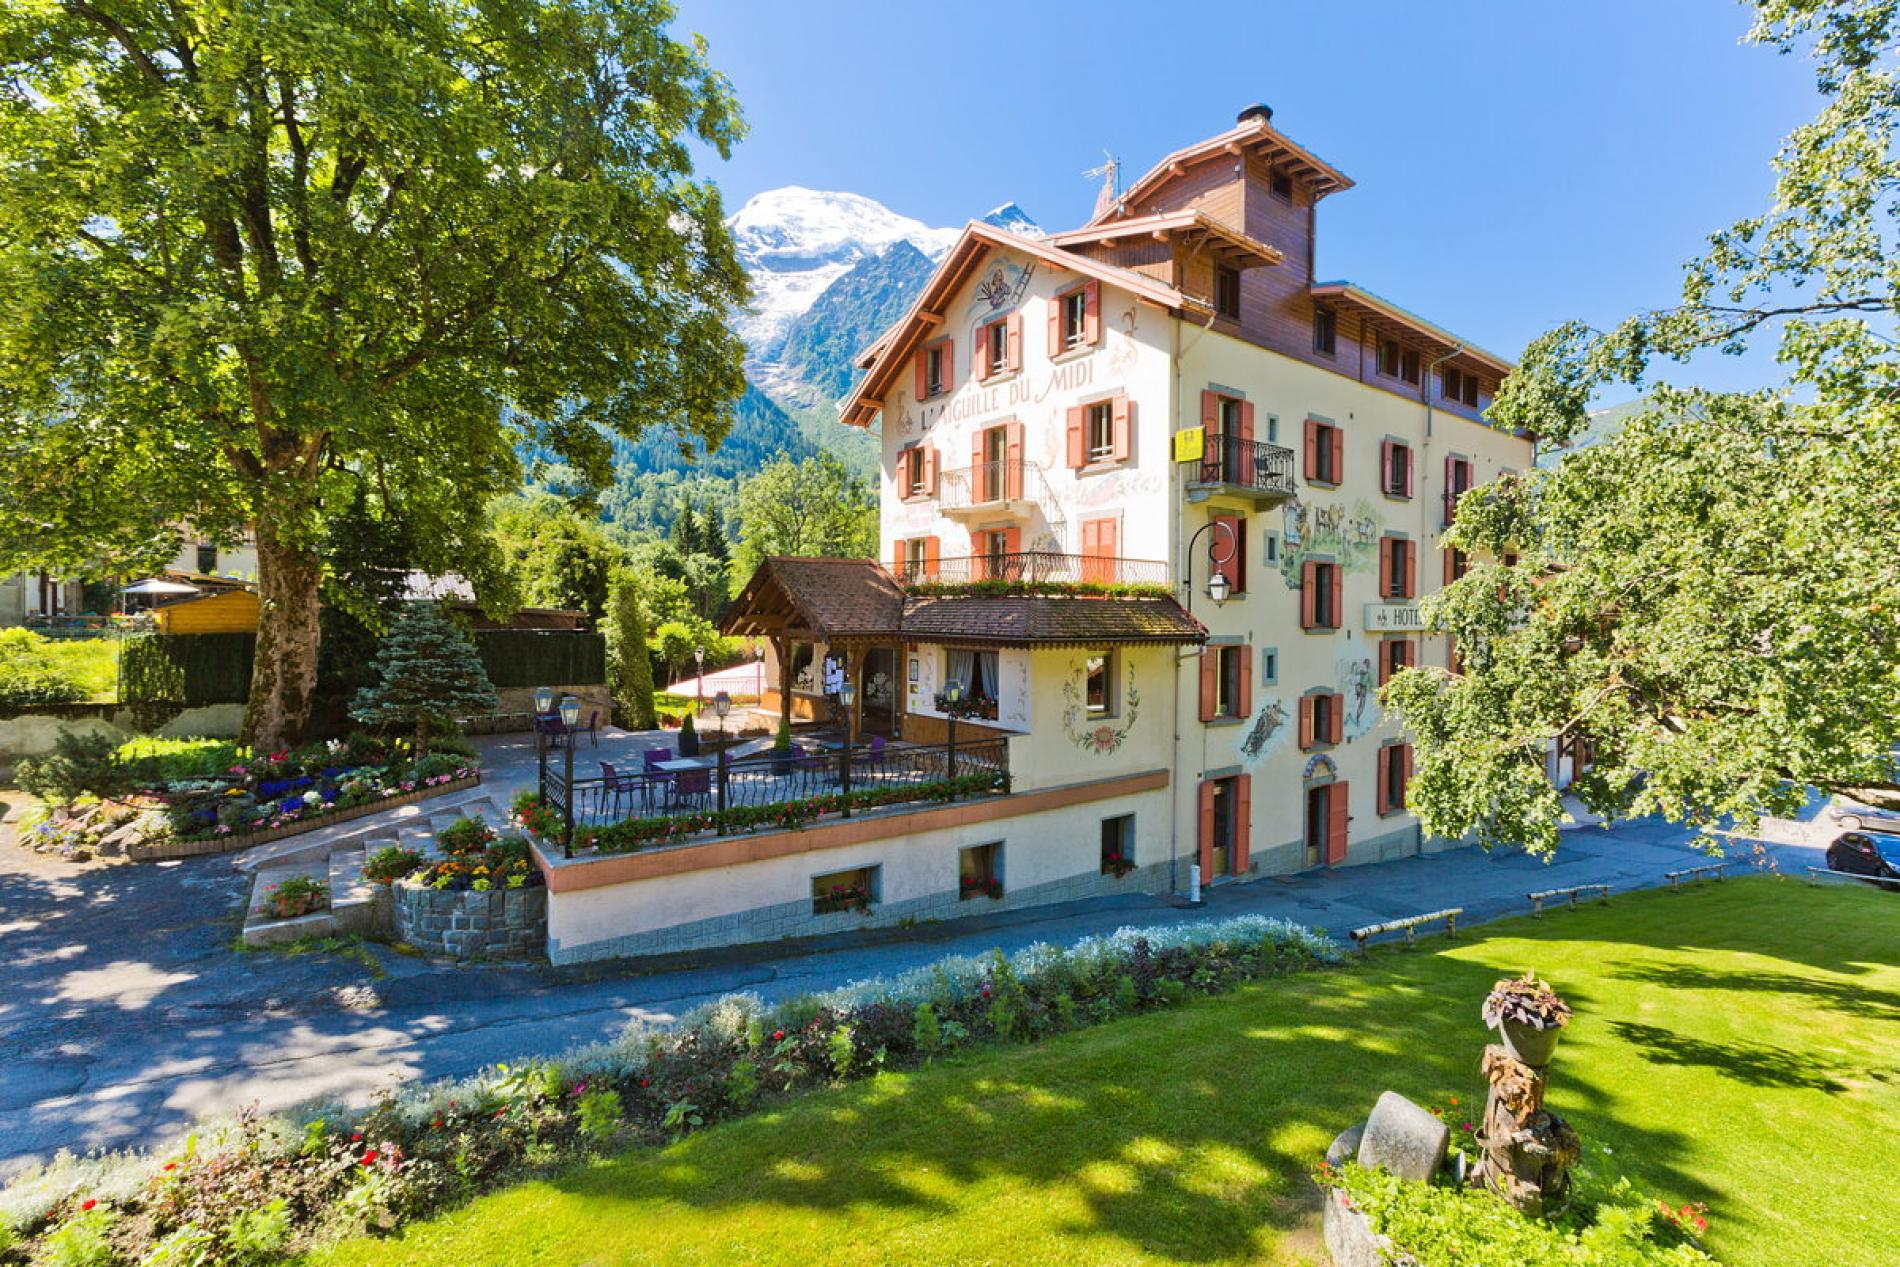 ∞ Logis Hotel Chamonix Mont Blanc Hotel Aiguille du Midi